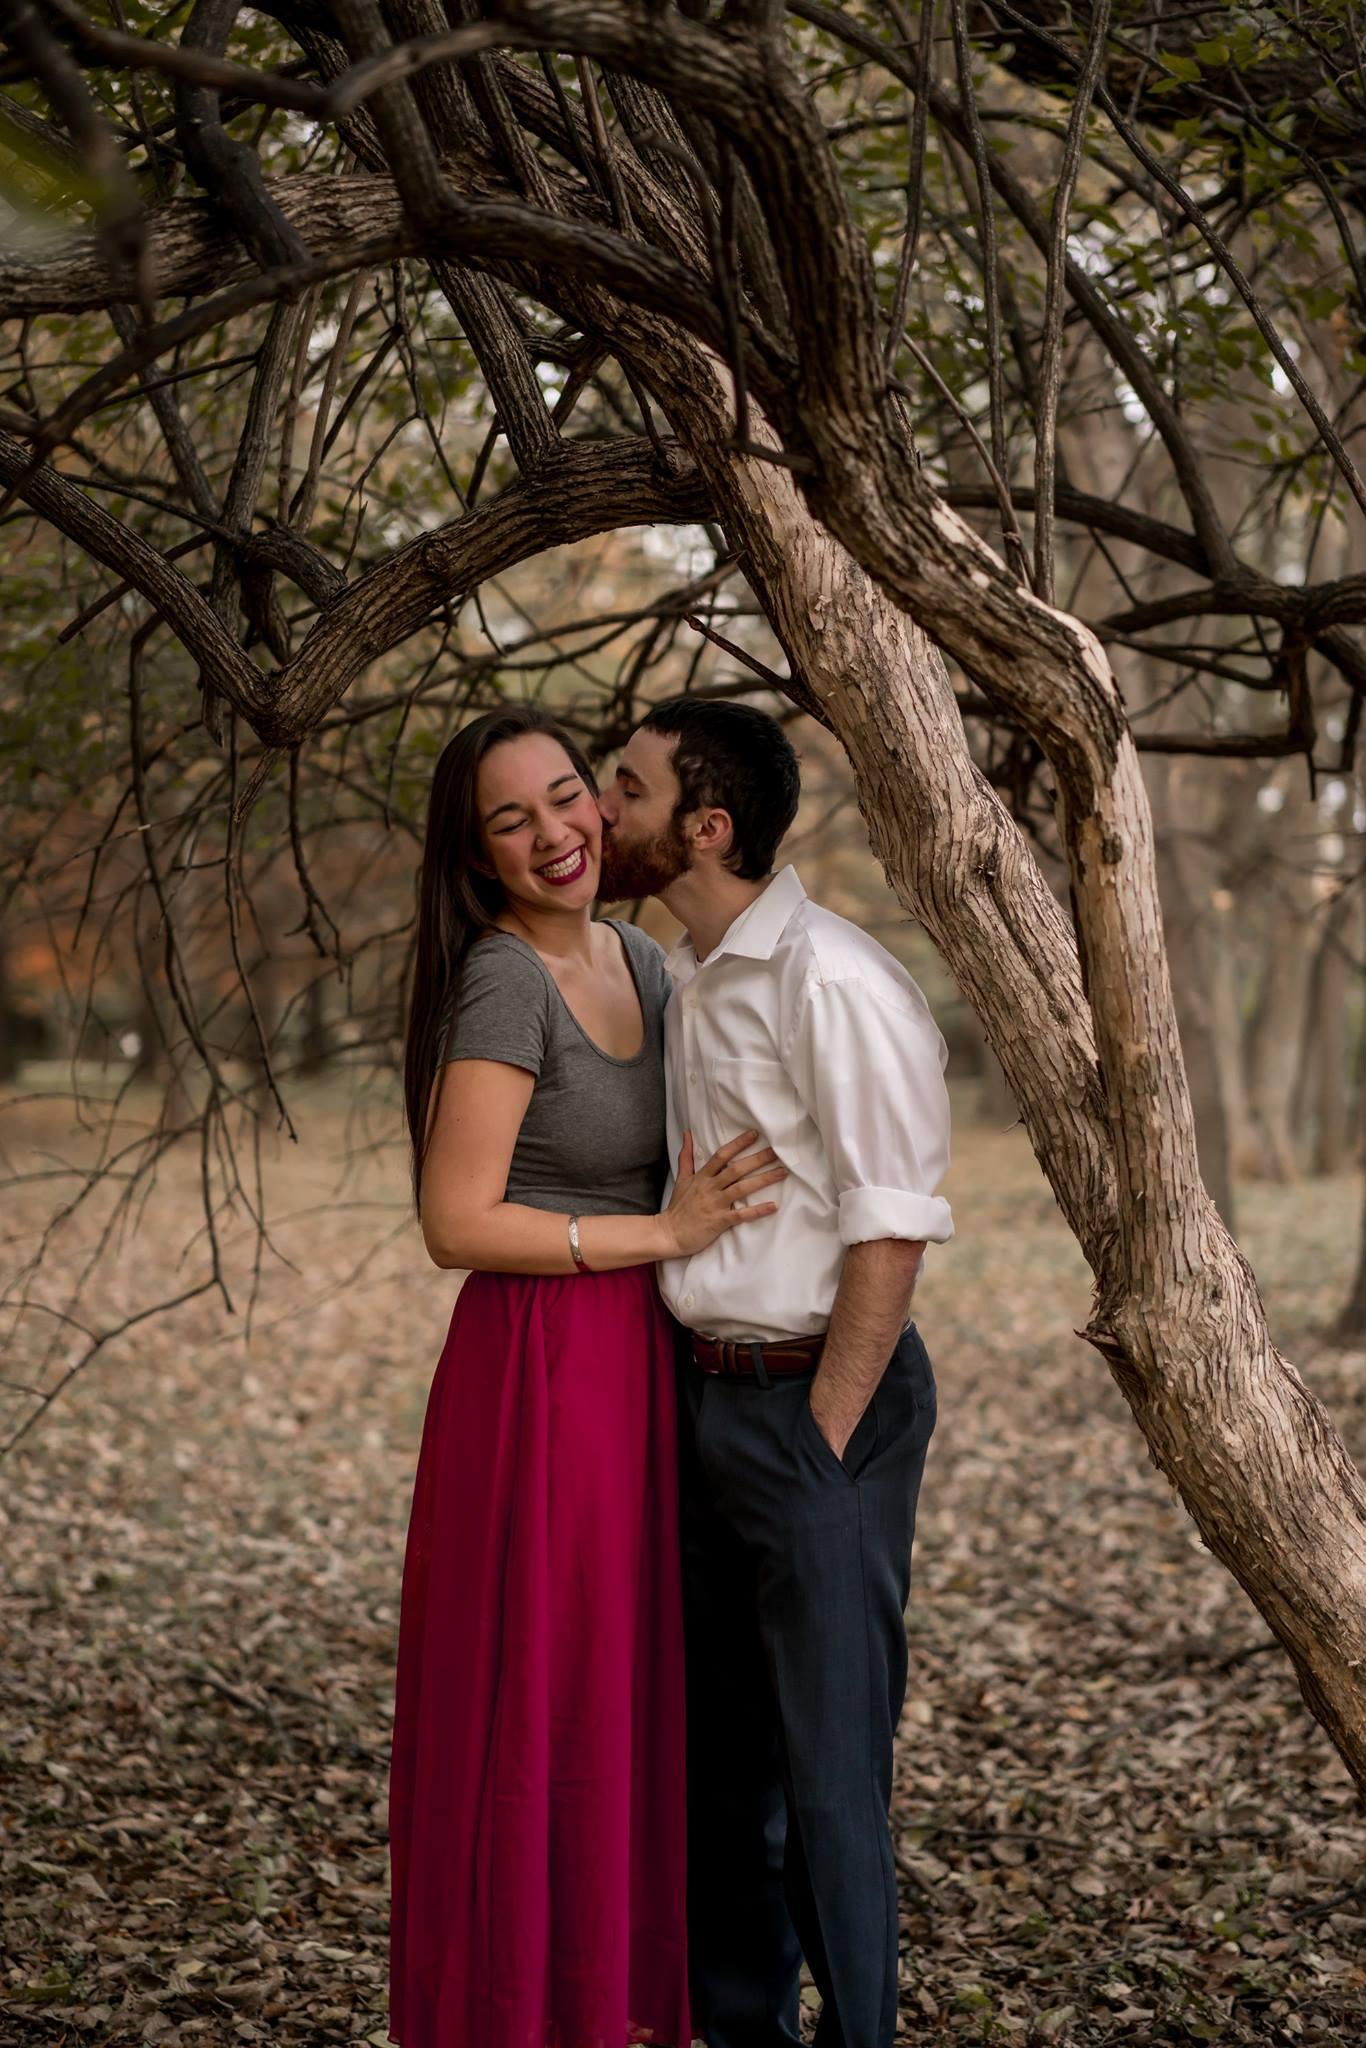 couple engagement field photo louisville photographer